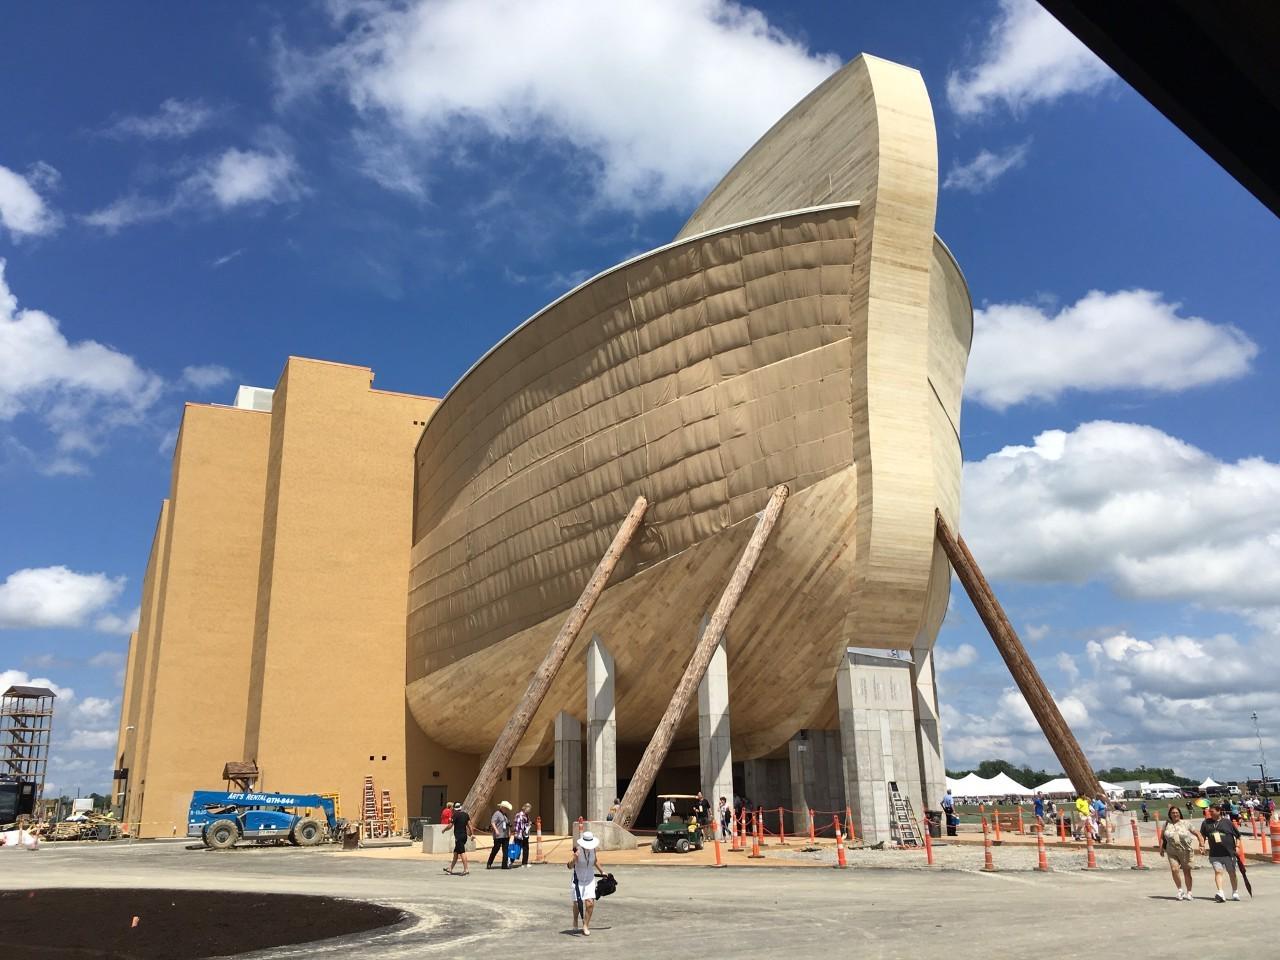 Ark exterior rear view